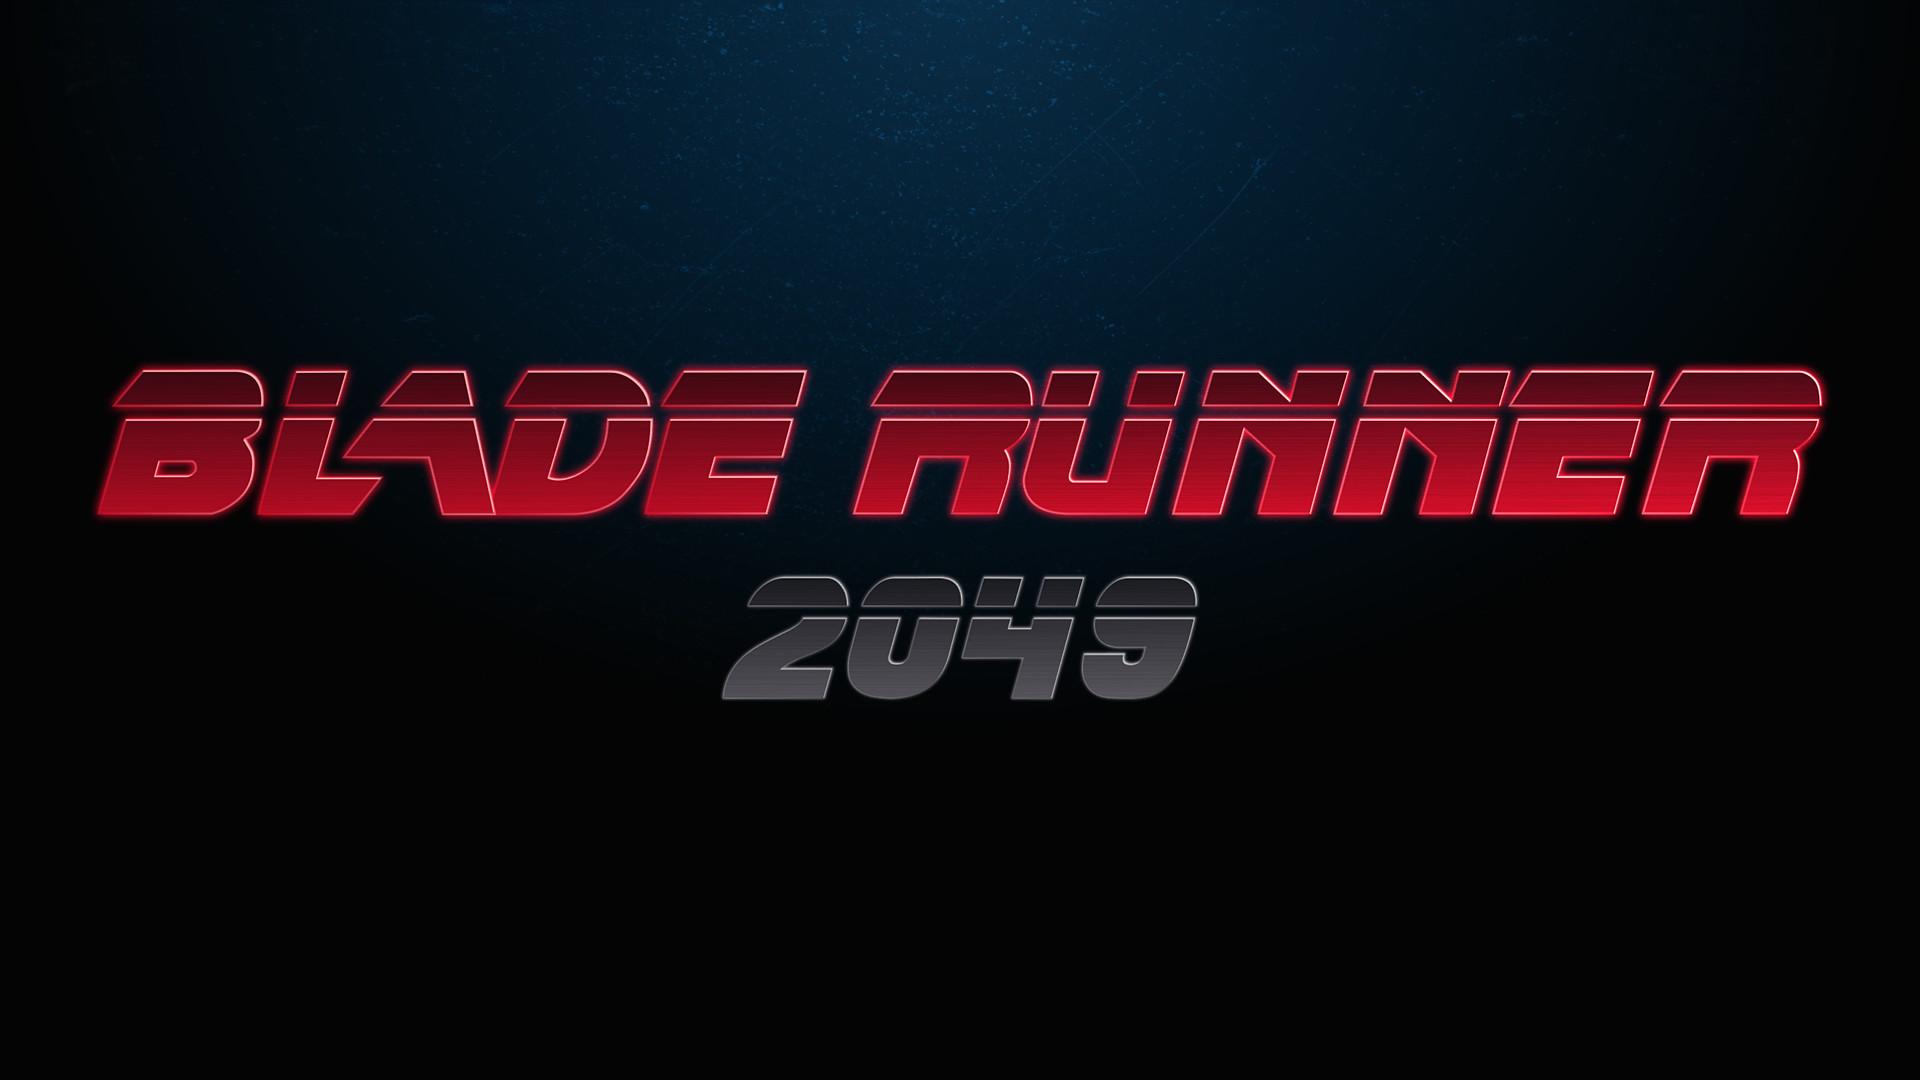 … Blade Runner 2049 wallpaper HD by kartine29